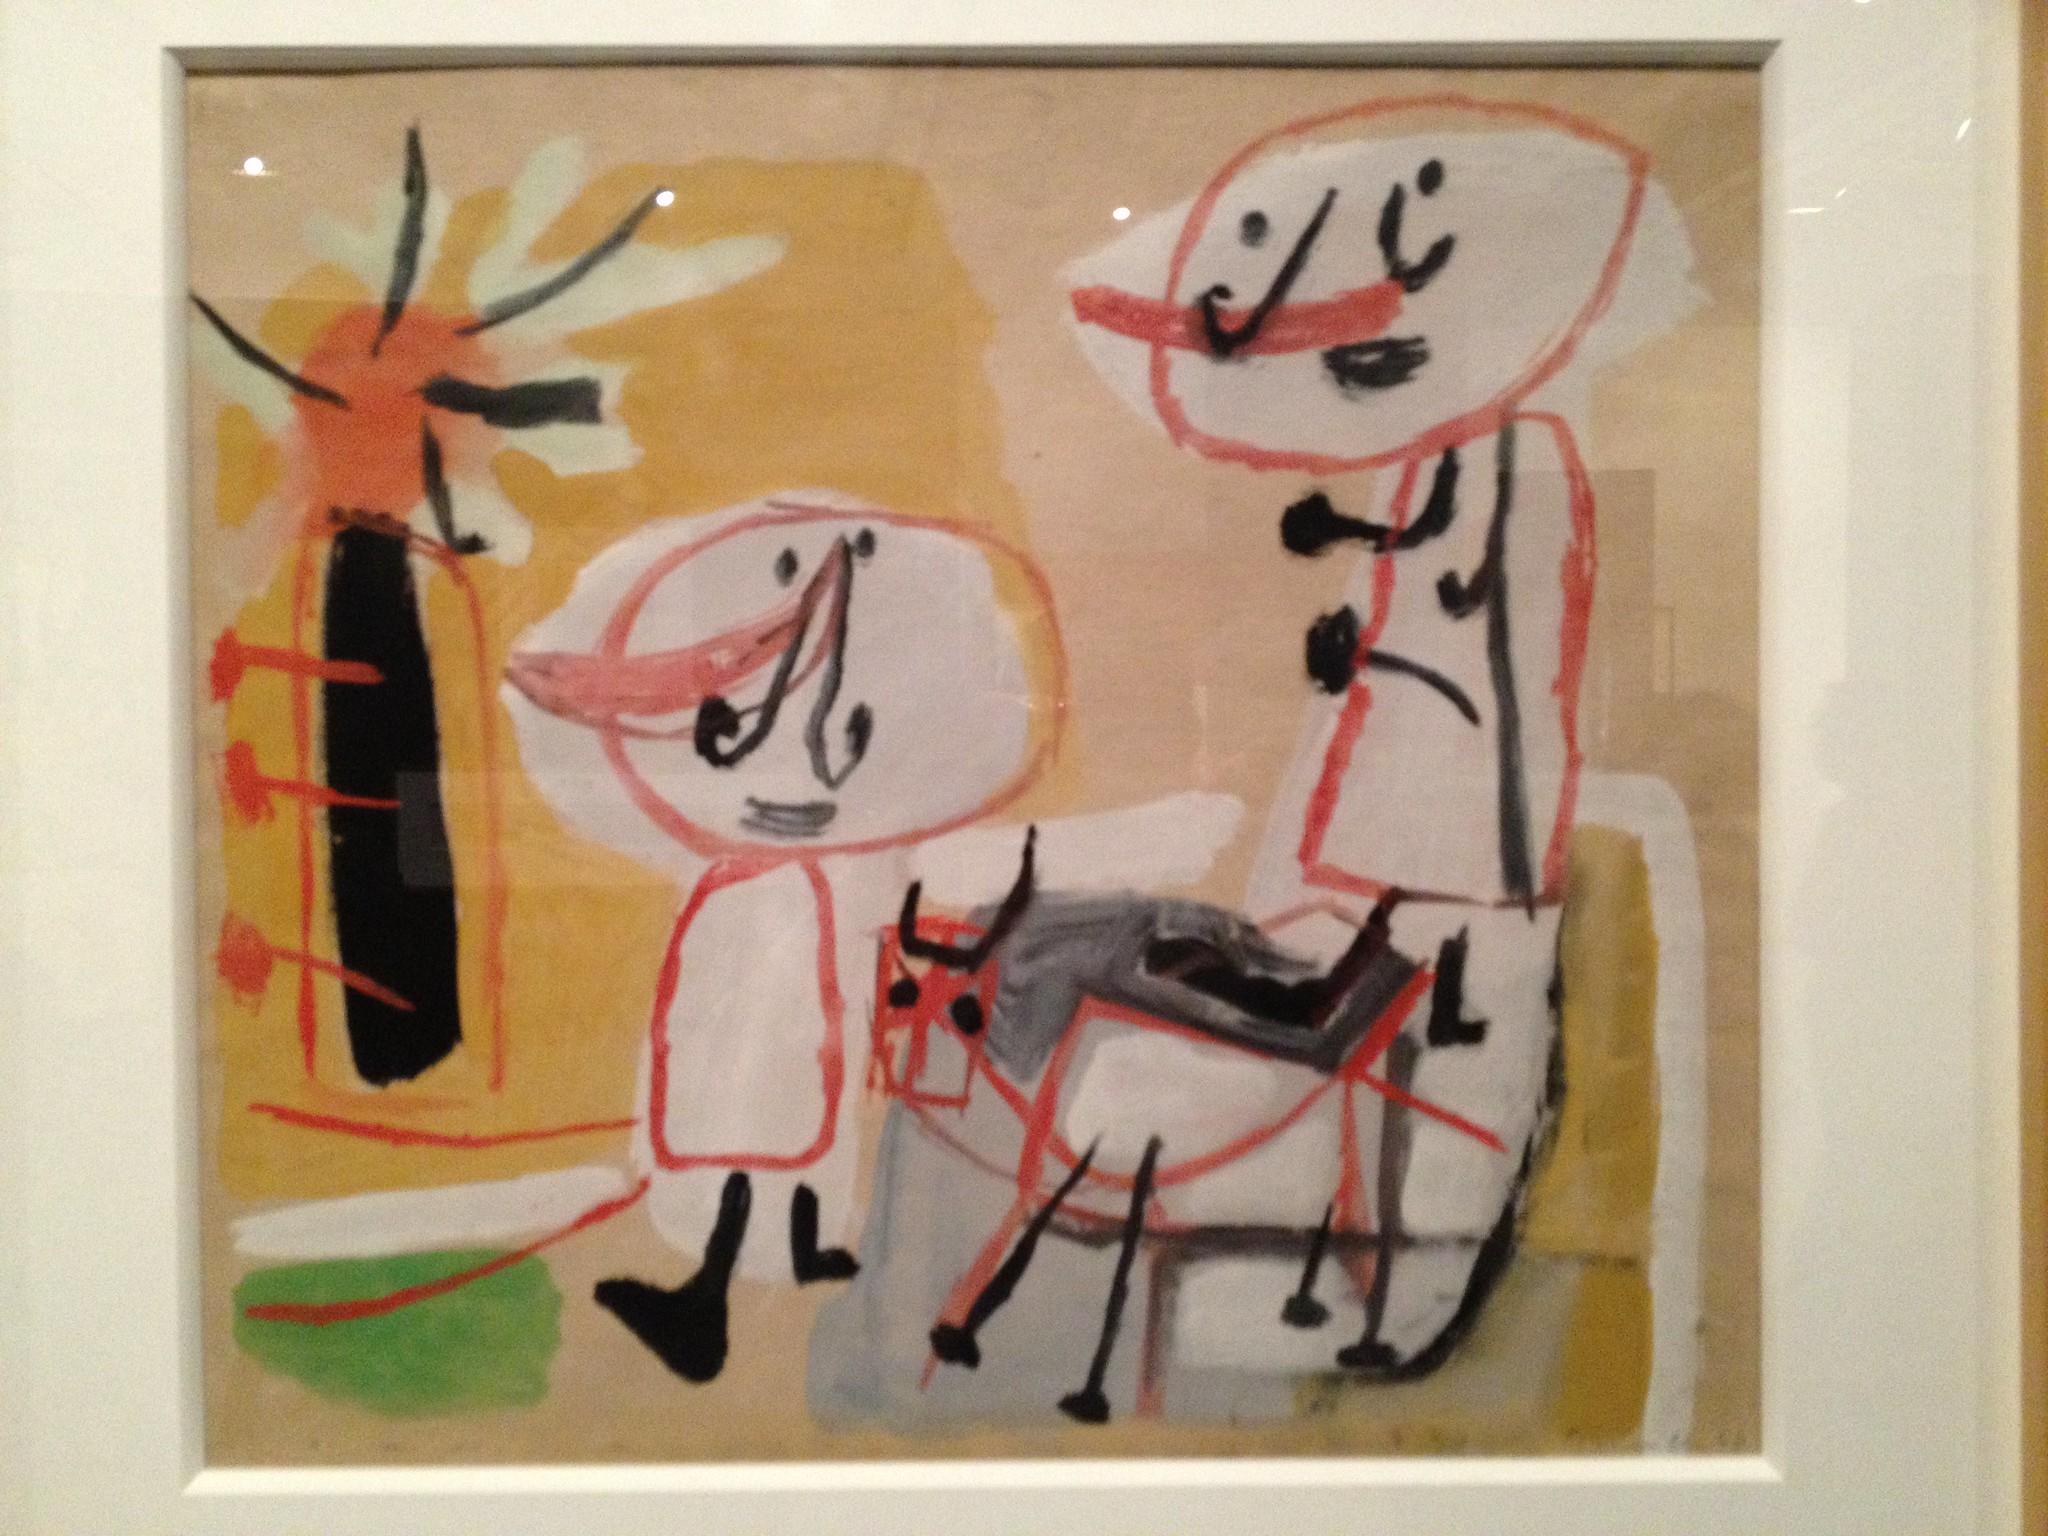 Corneille, Familie met Hond, 1949